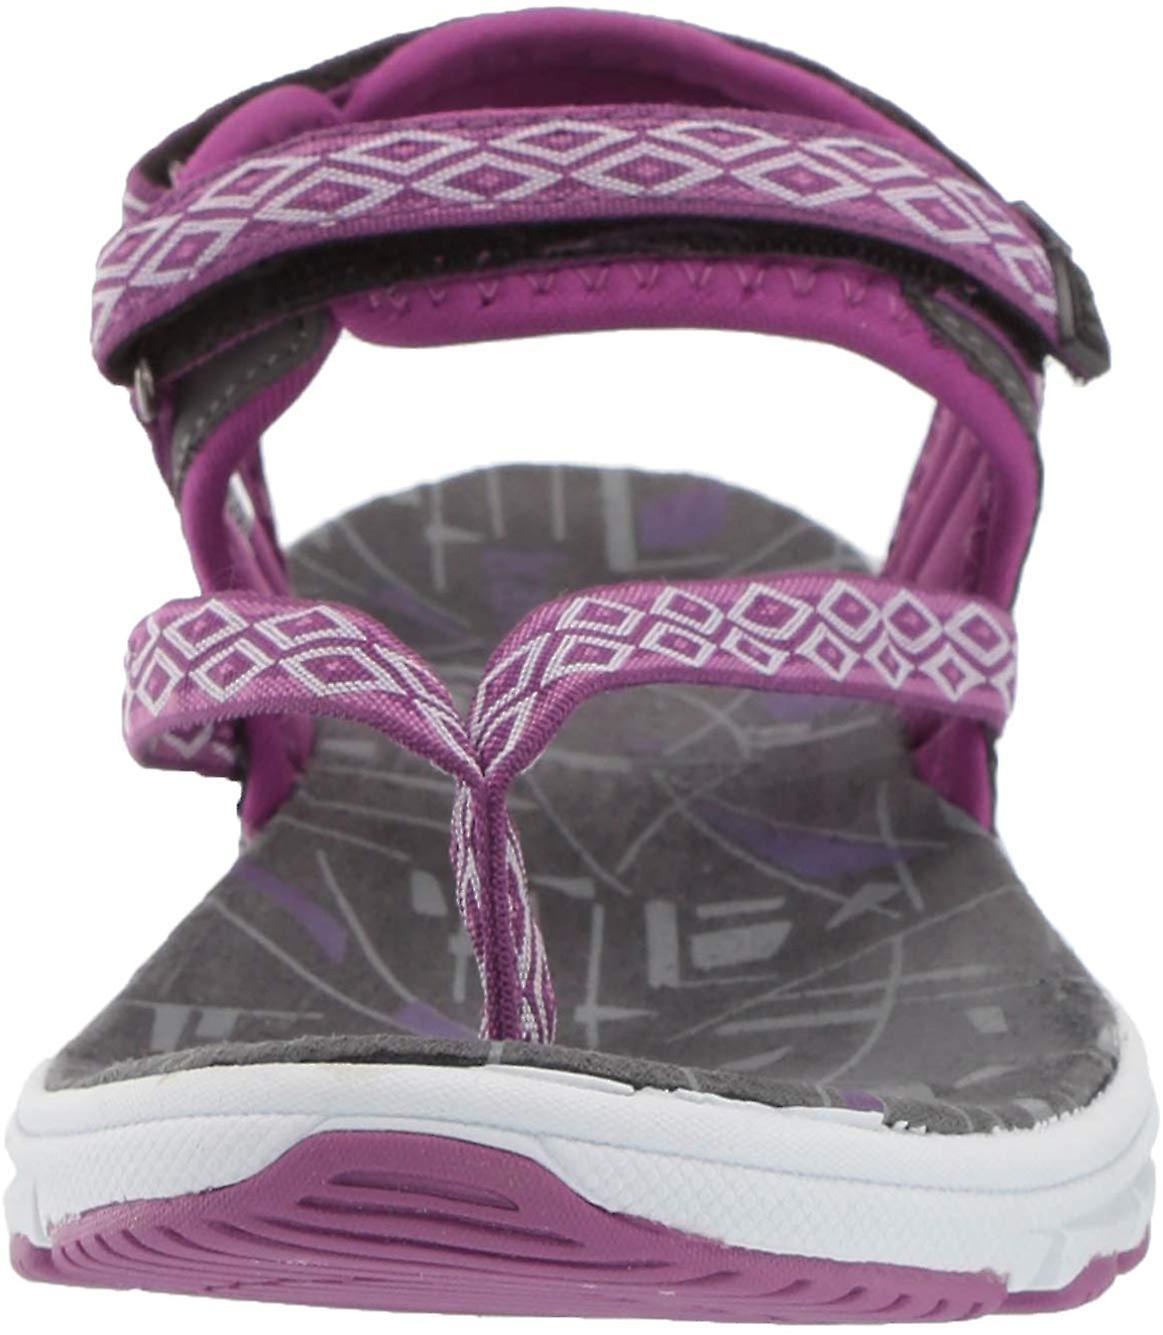 Kamik Women's Tampa Sport Sandal